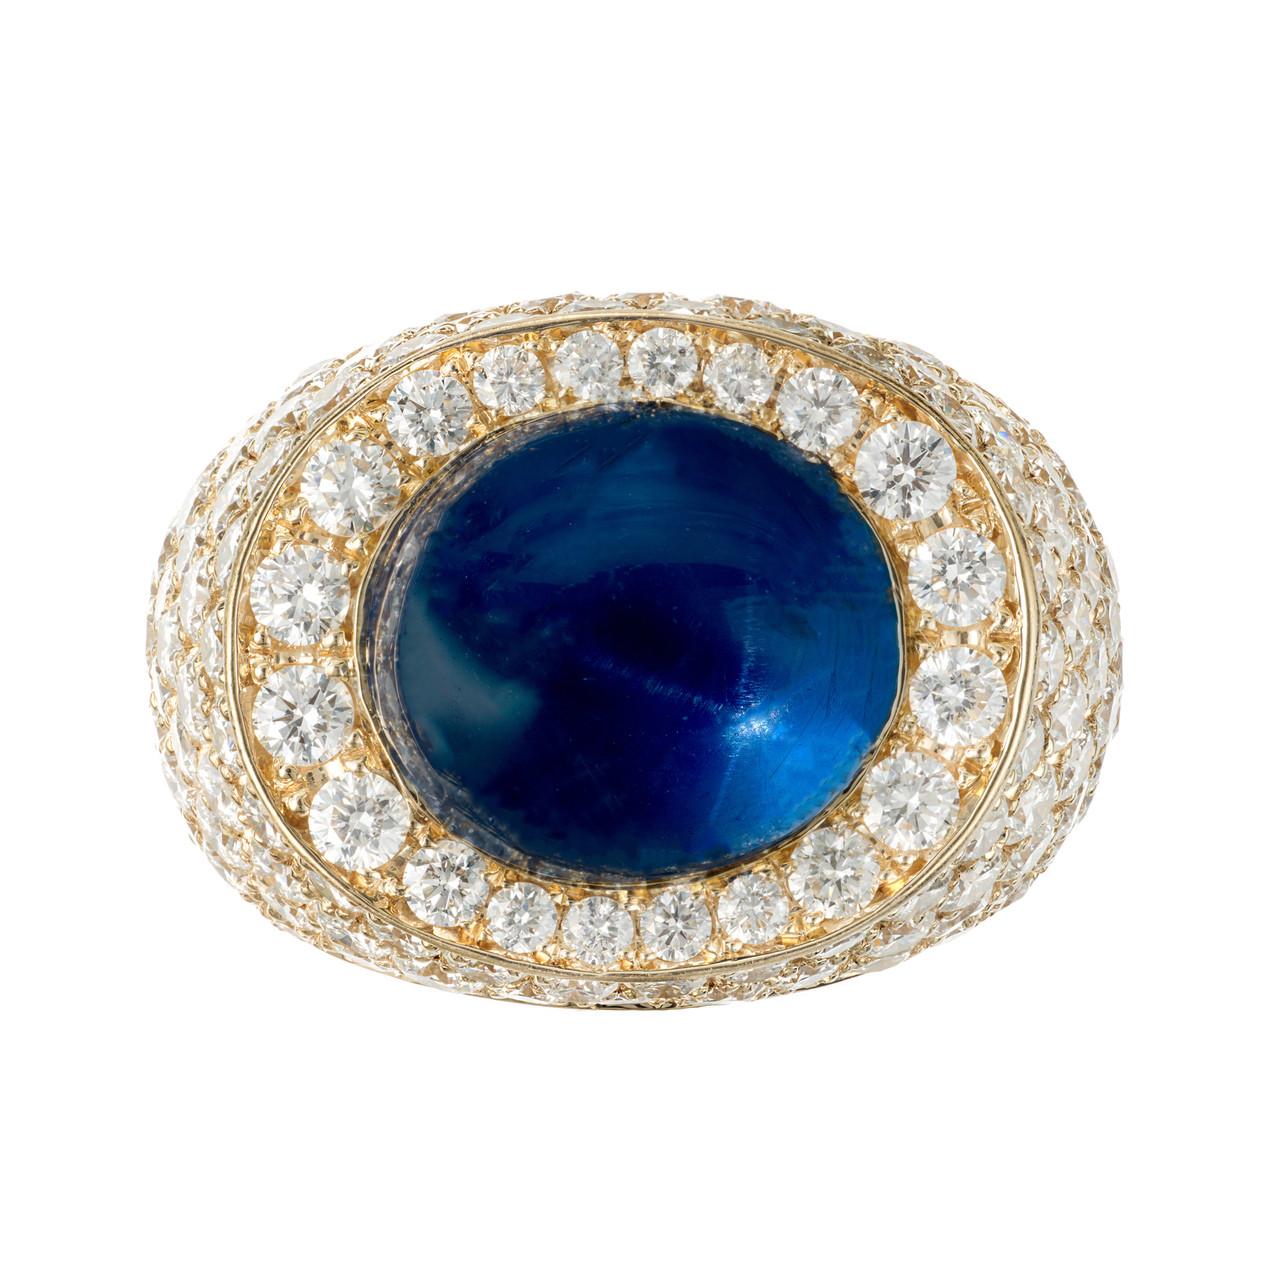 3ebe454e05fc6 David Webb 14.4 Carat Star Sapphire Diamond 18k Yellow Gold Ring